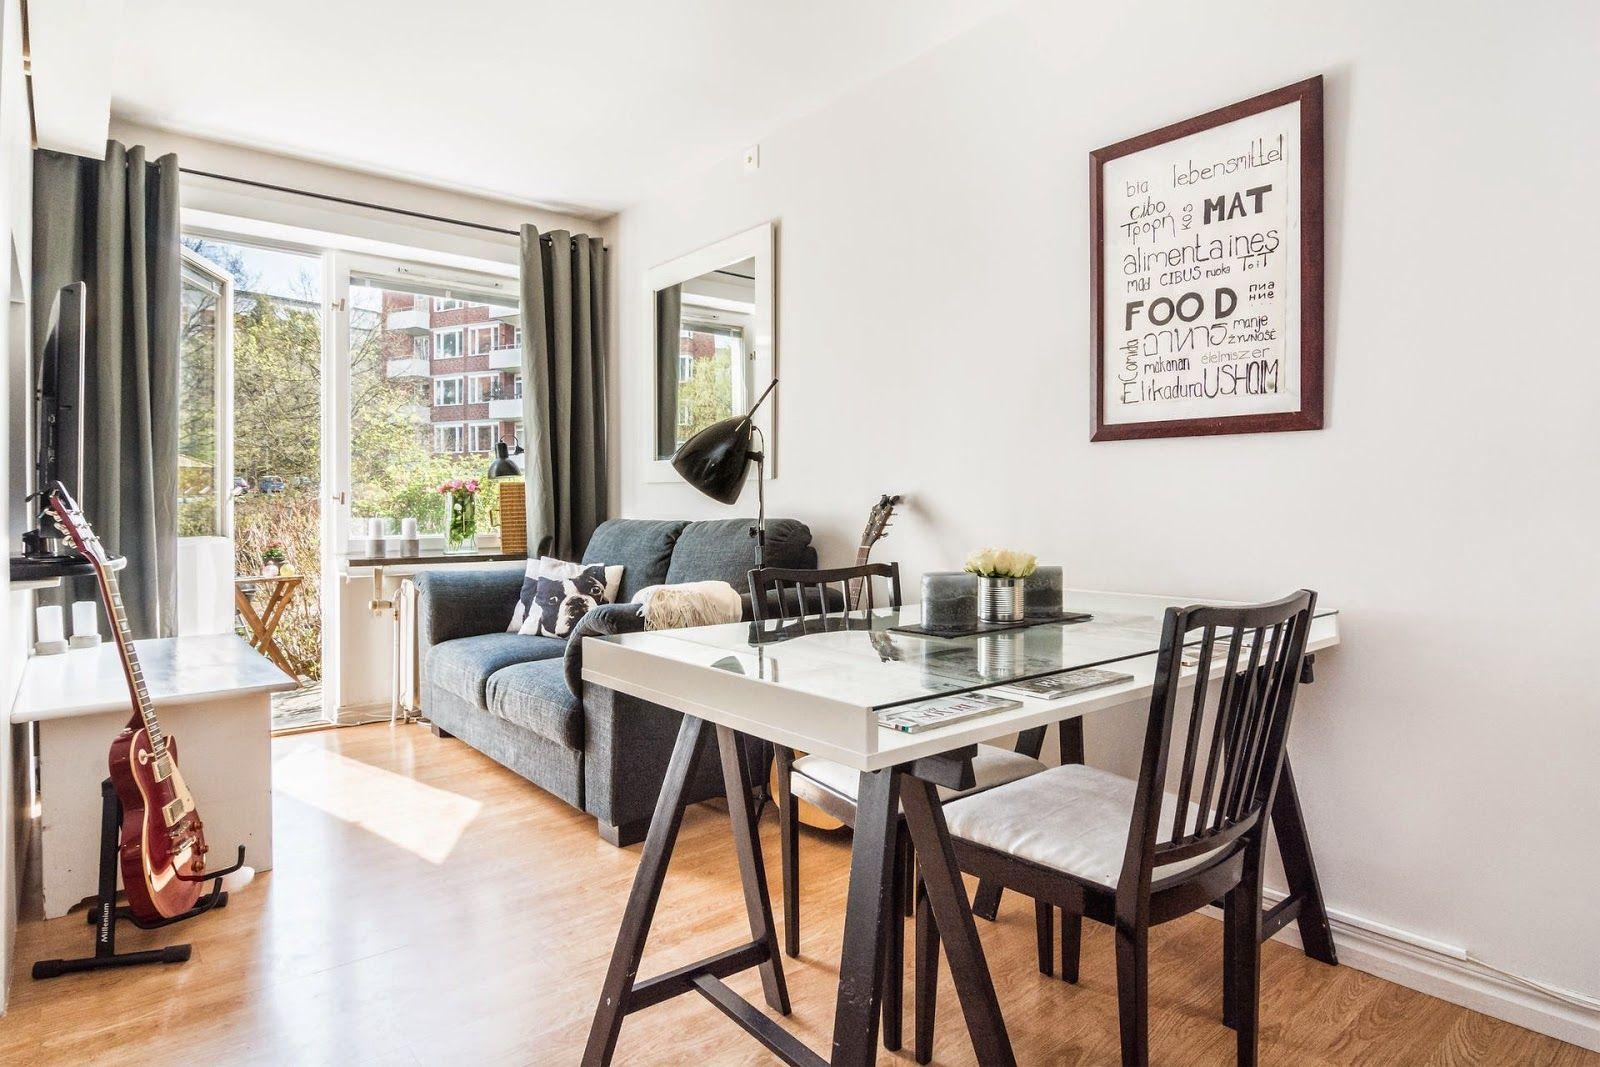 small condo interior design ideas living room beautiful pictures rh pinterest com